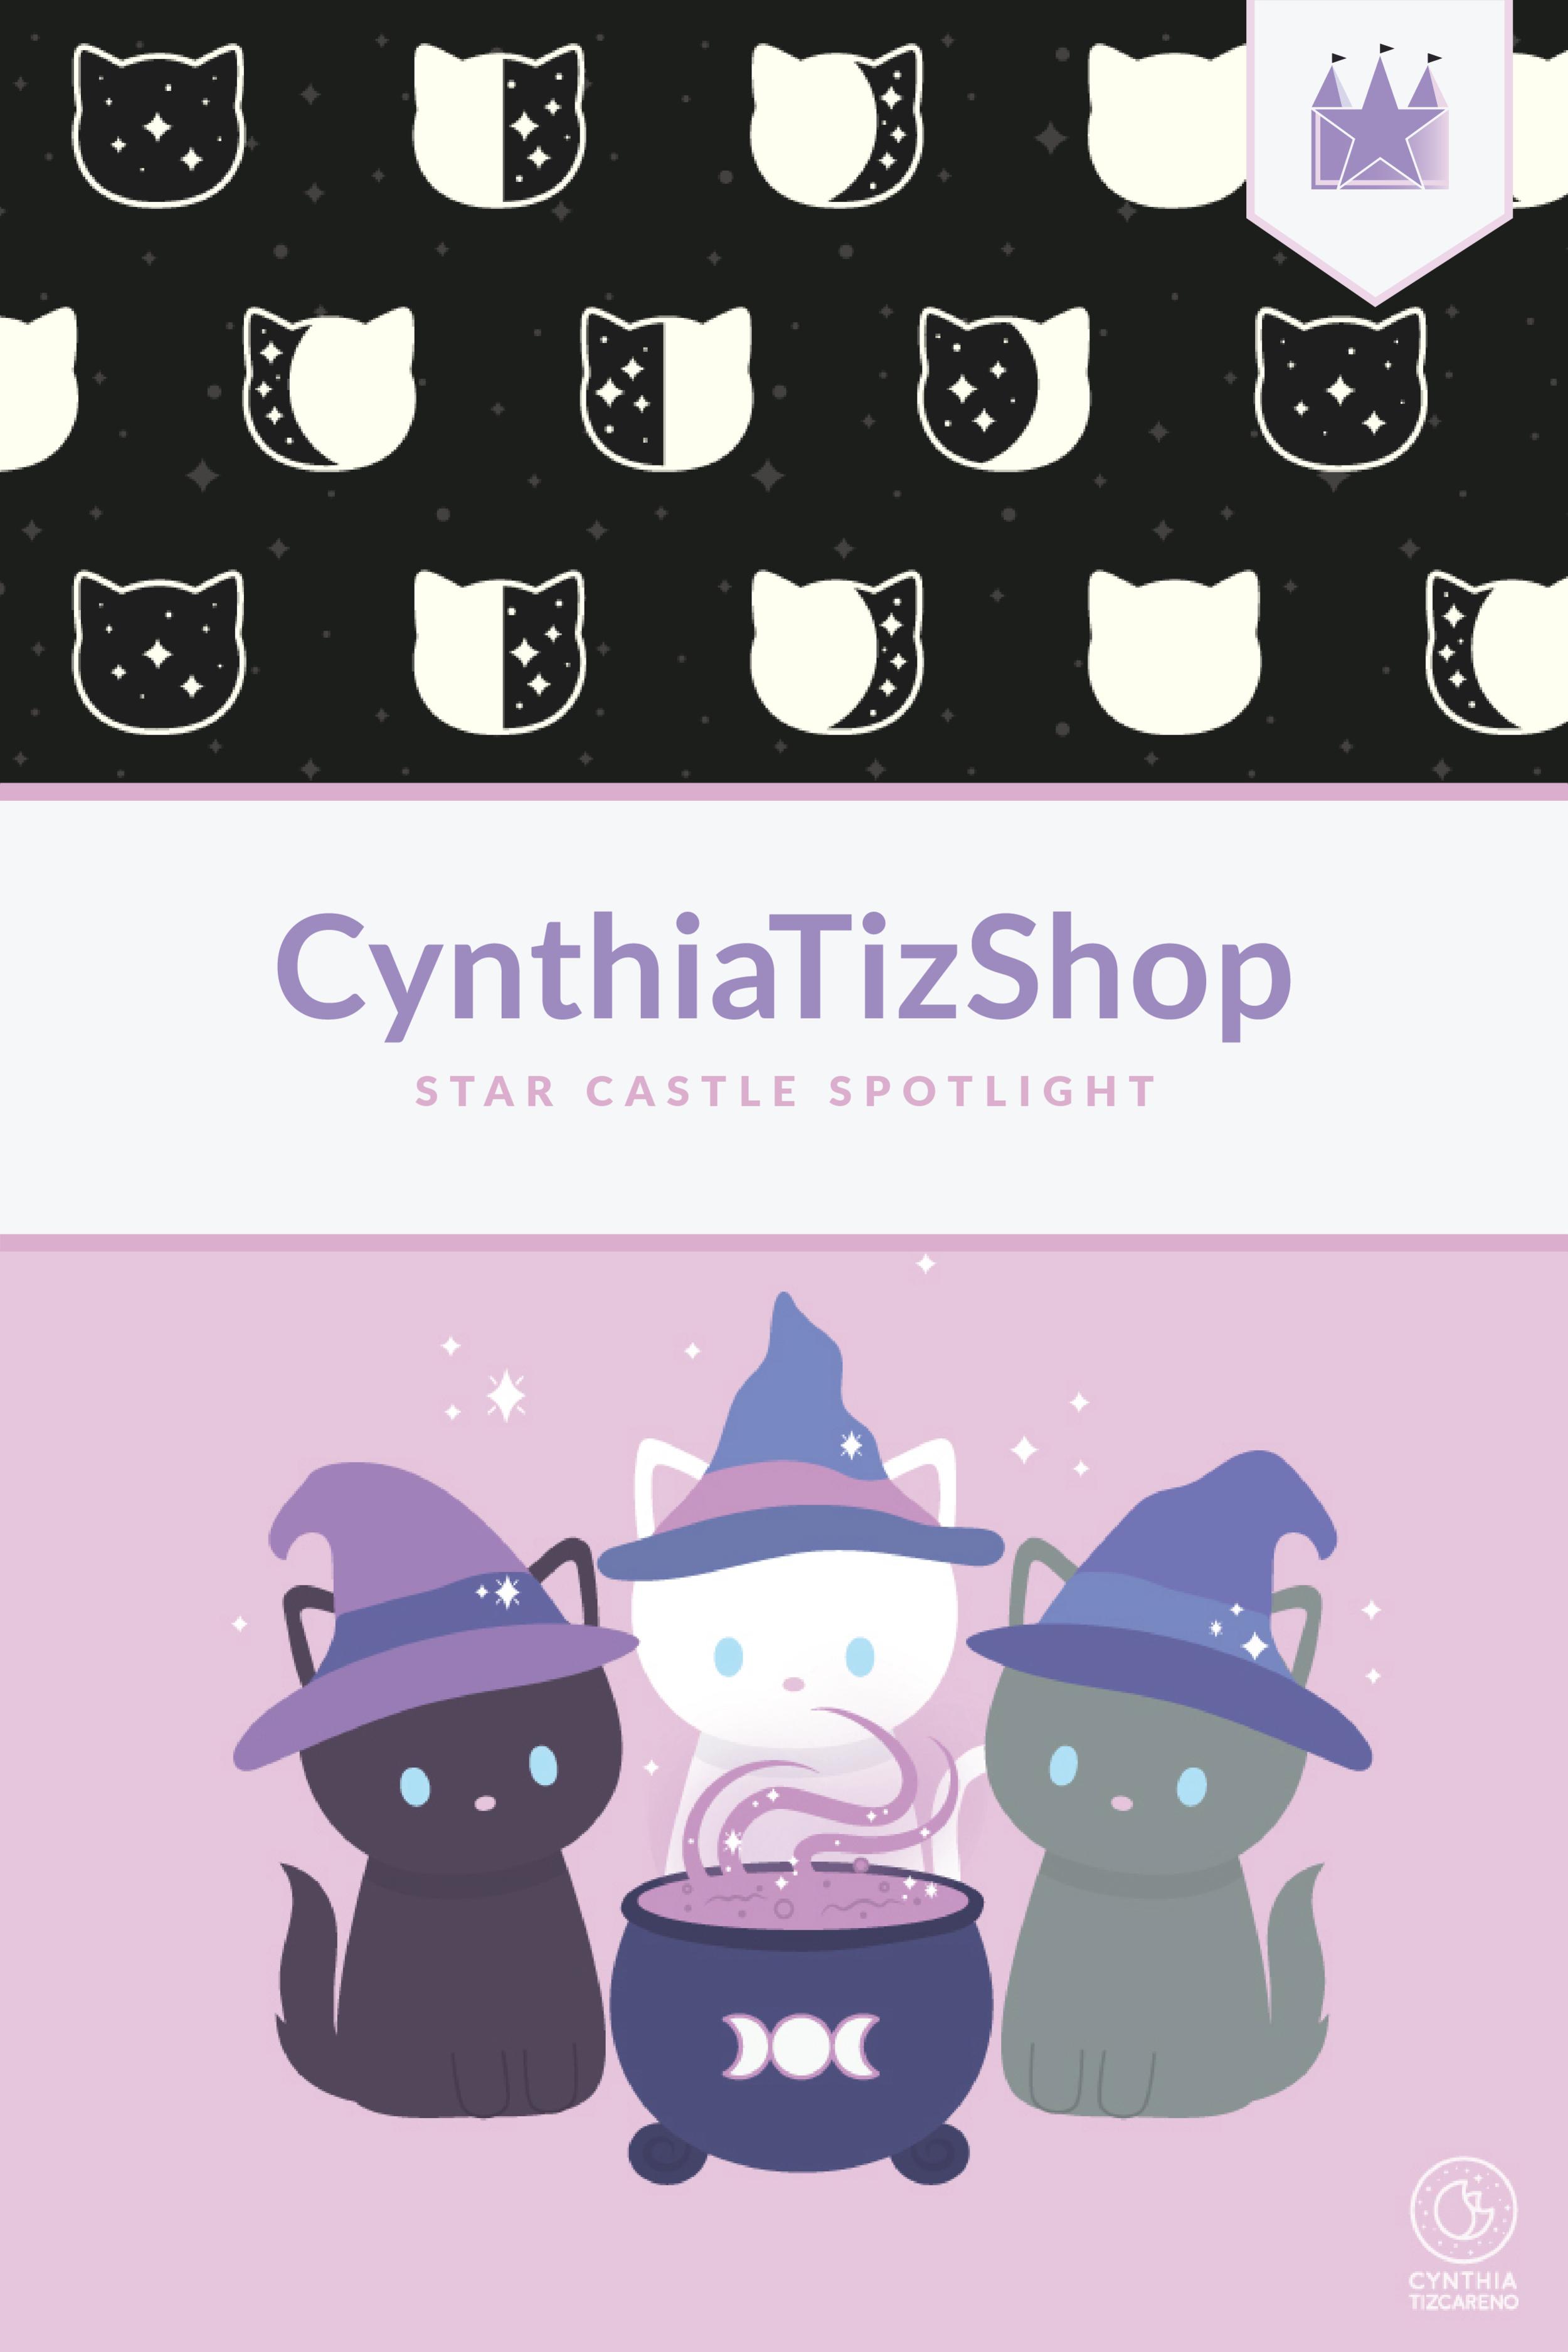 CynthiaTizShop Kawaii Cats Illustration